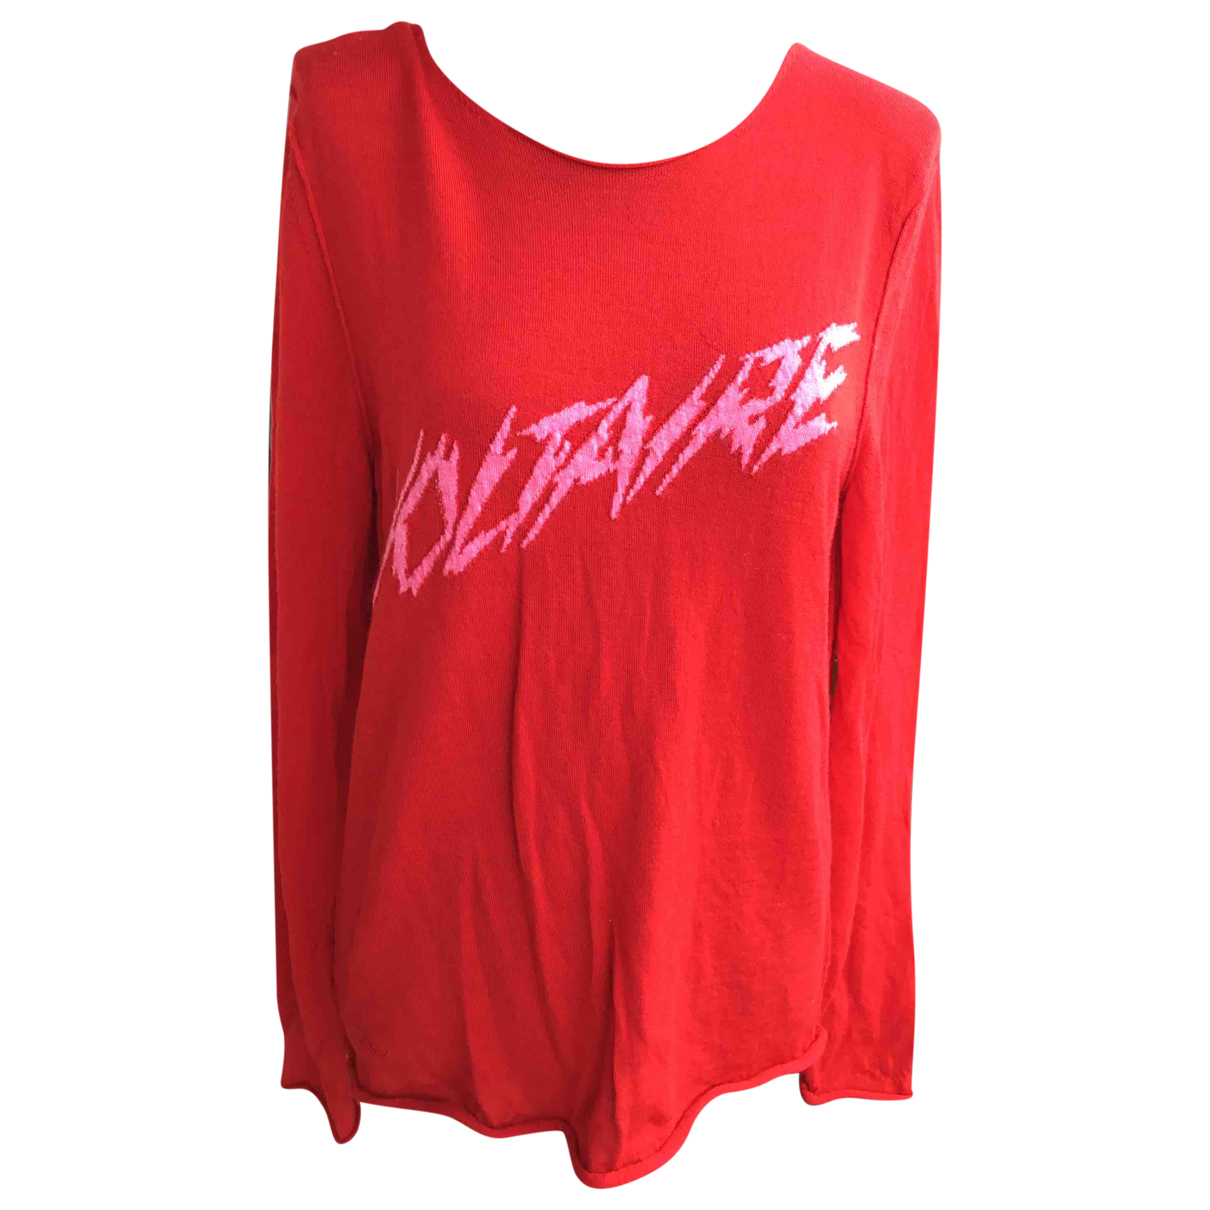 Zadig & Voltaire Spring Summer 2019 Red Wool Knitwear for Women M International